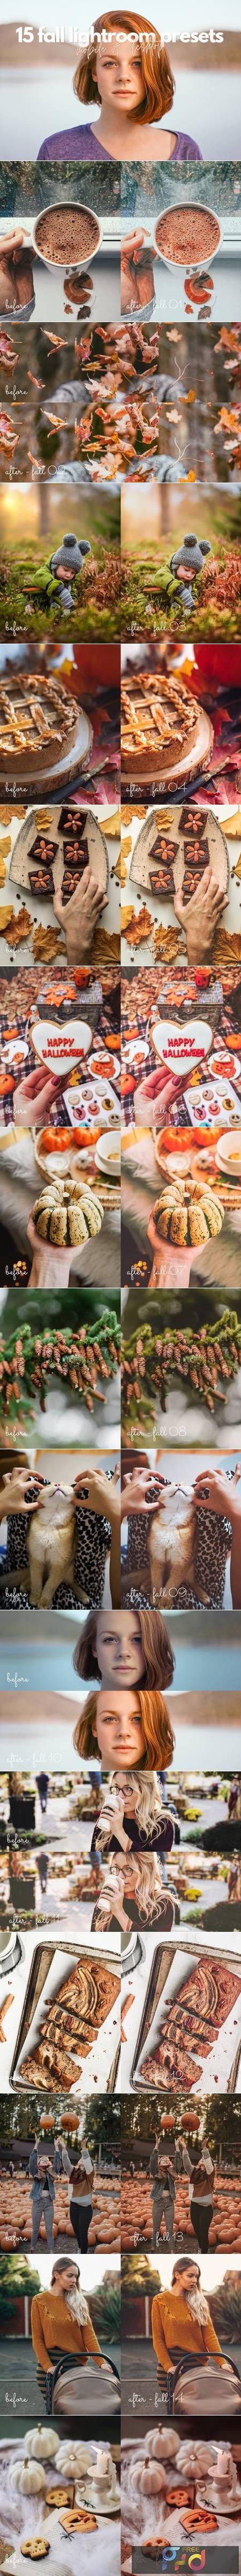 15 Fall - Autumn Lightroom Presets 5499857 1